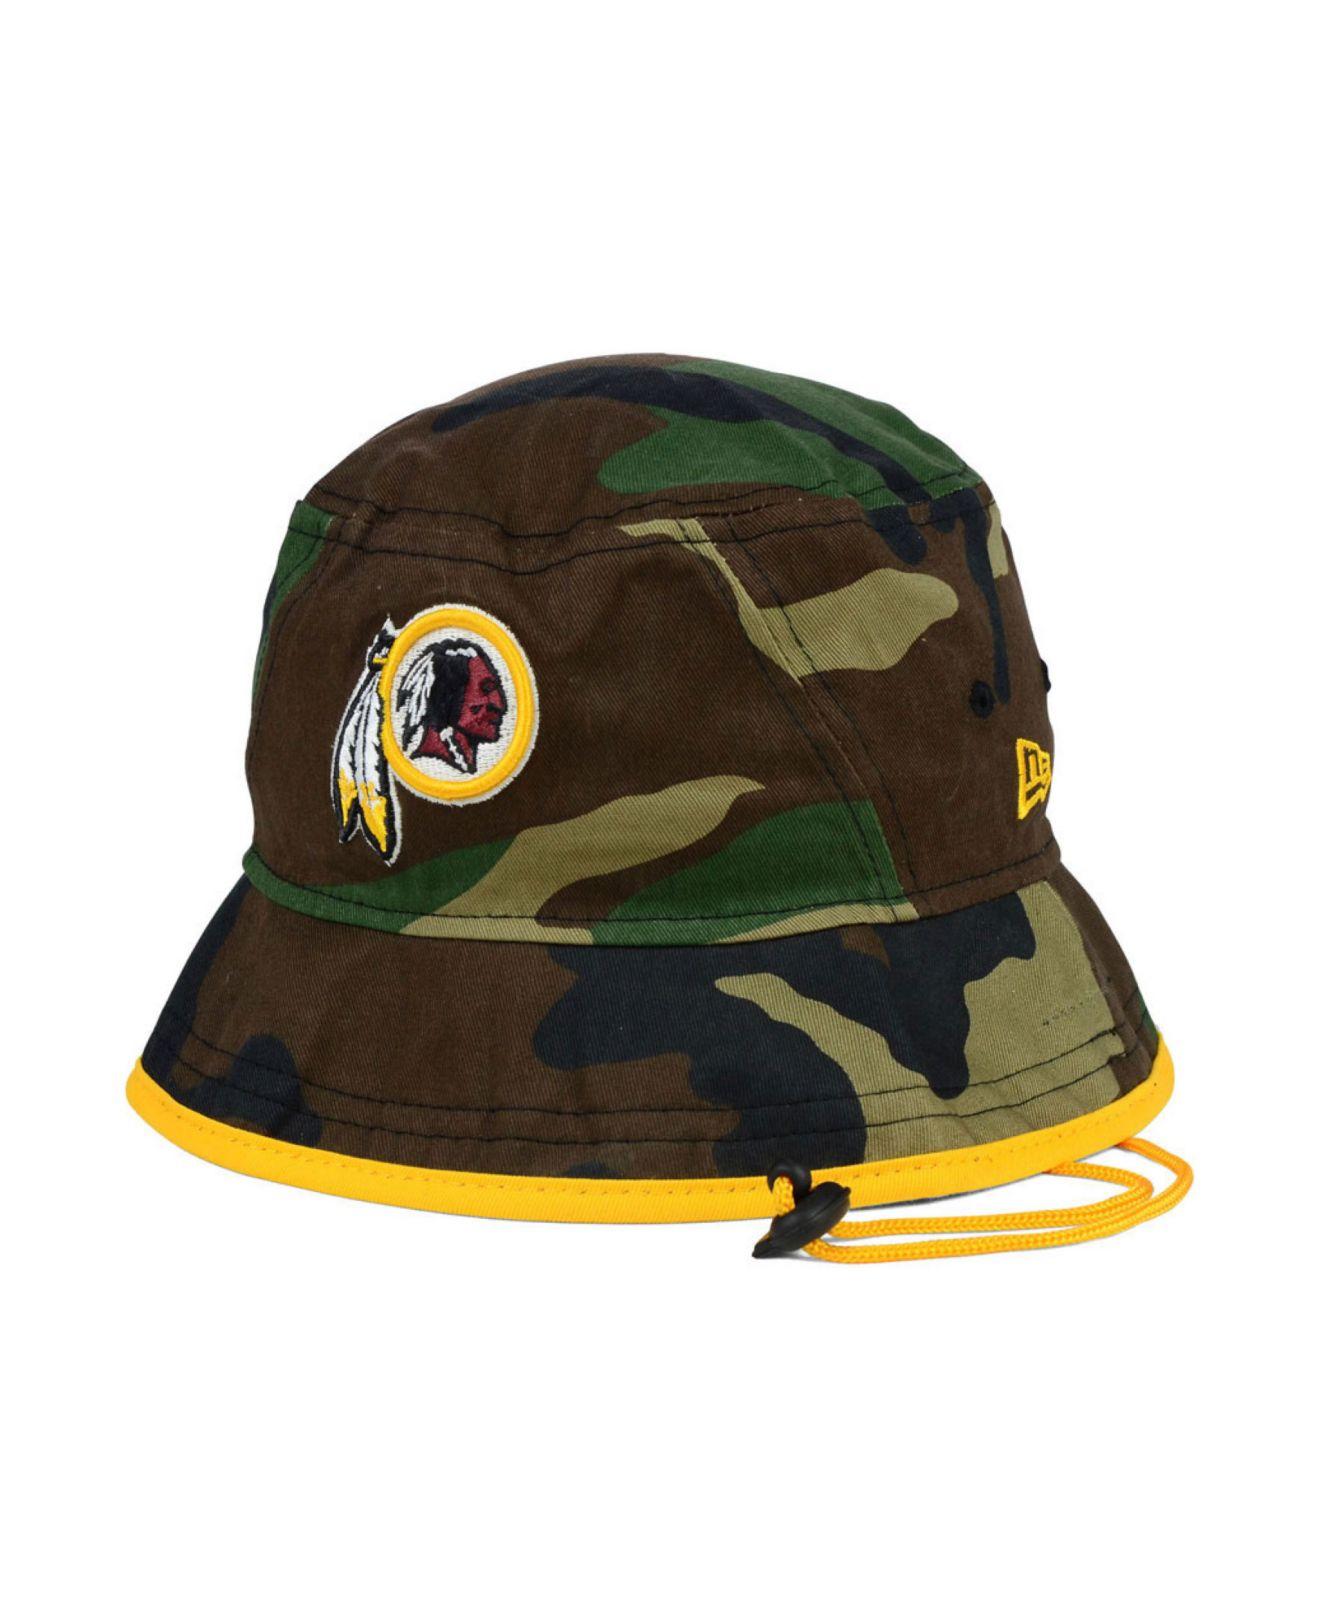 Lyst - Ktz Washington Redskins Nfl Camo Pop Bucket in Green for Men a5e53a18d37